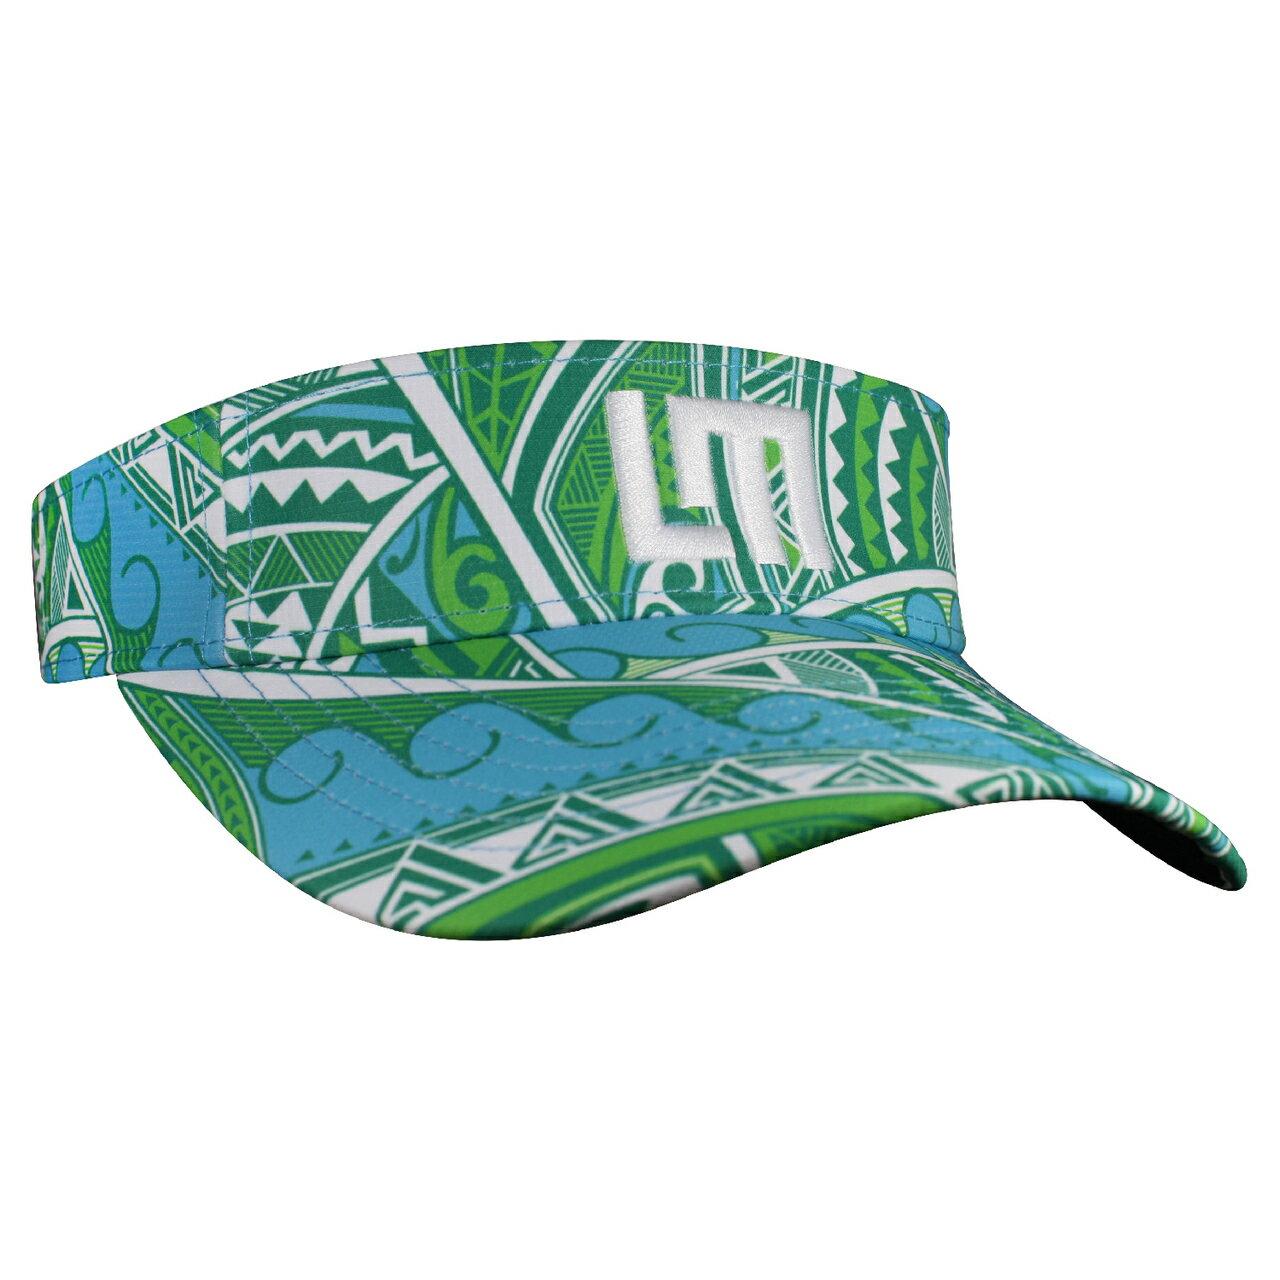 LOUDMOUTH 英國高爾夫服飾品牌-TATU藍綠中空帽